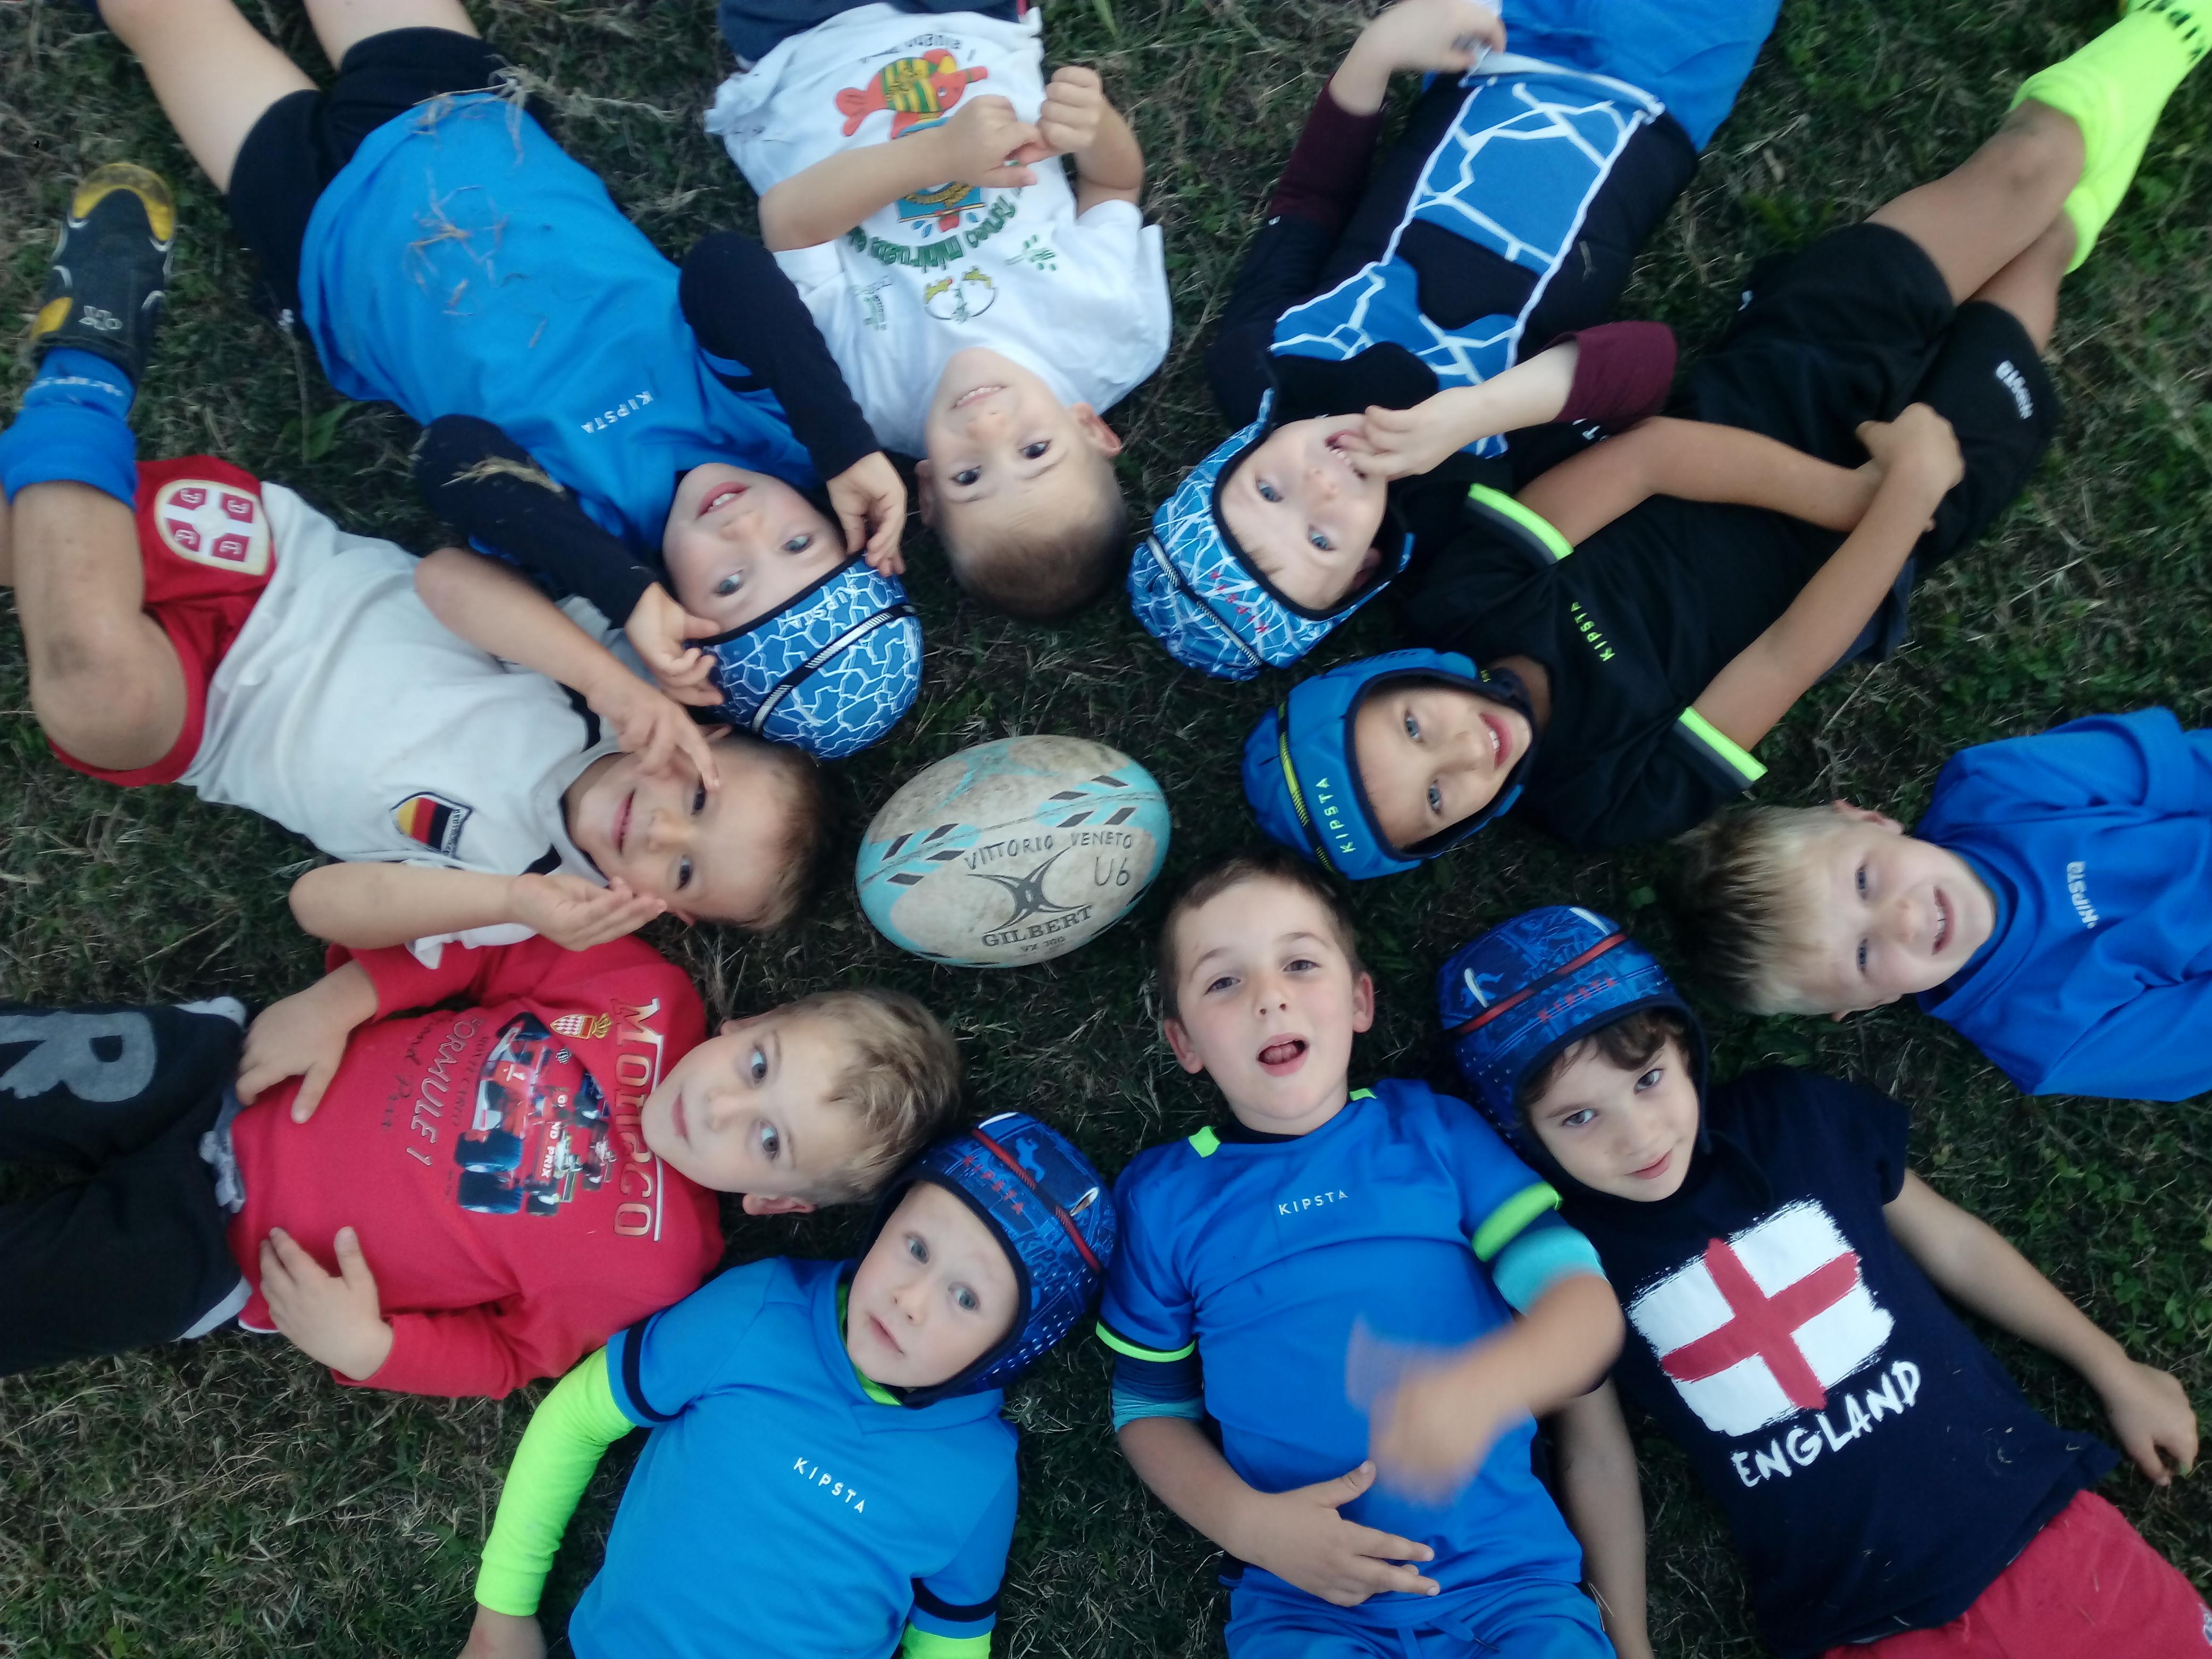 http://rugbyvittorioveneto.it/wp-content/uploads/2019/08/bocie-cerchio.jpg